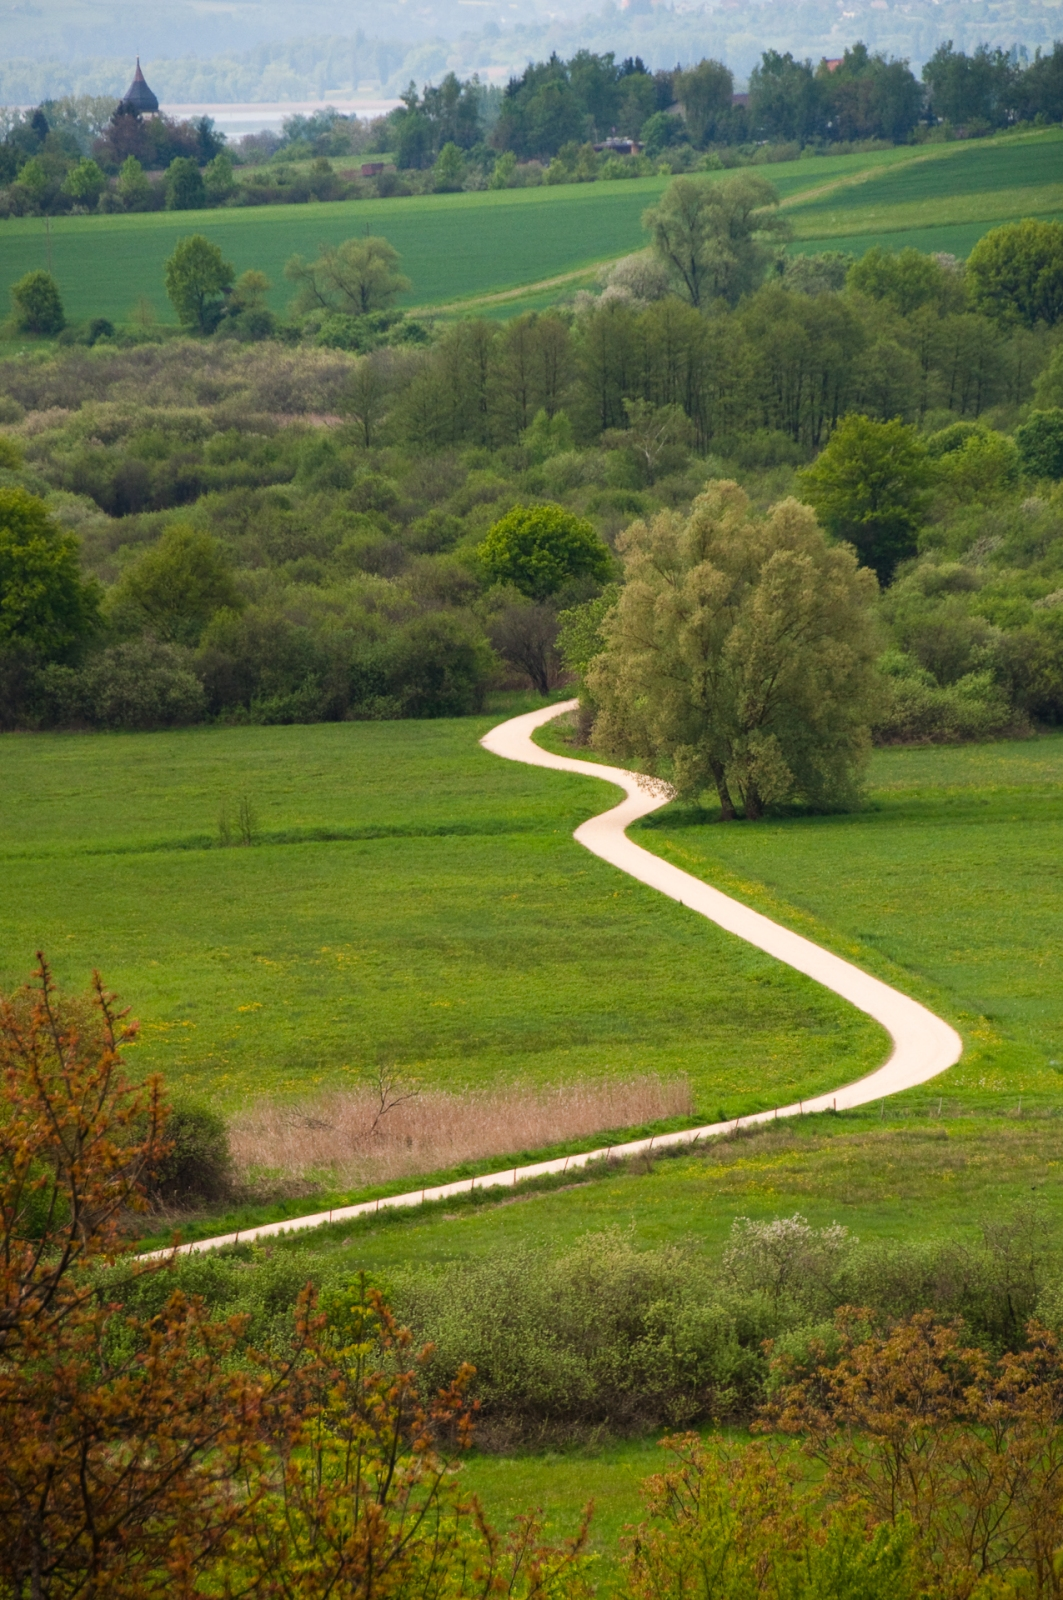 Grusväg Winding road gravel bodensjön bodensee lake constance